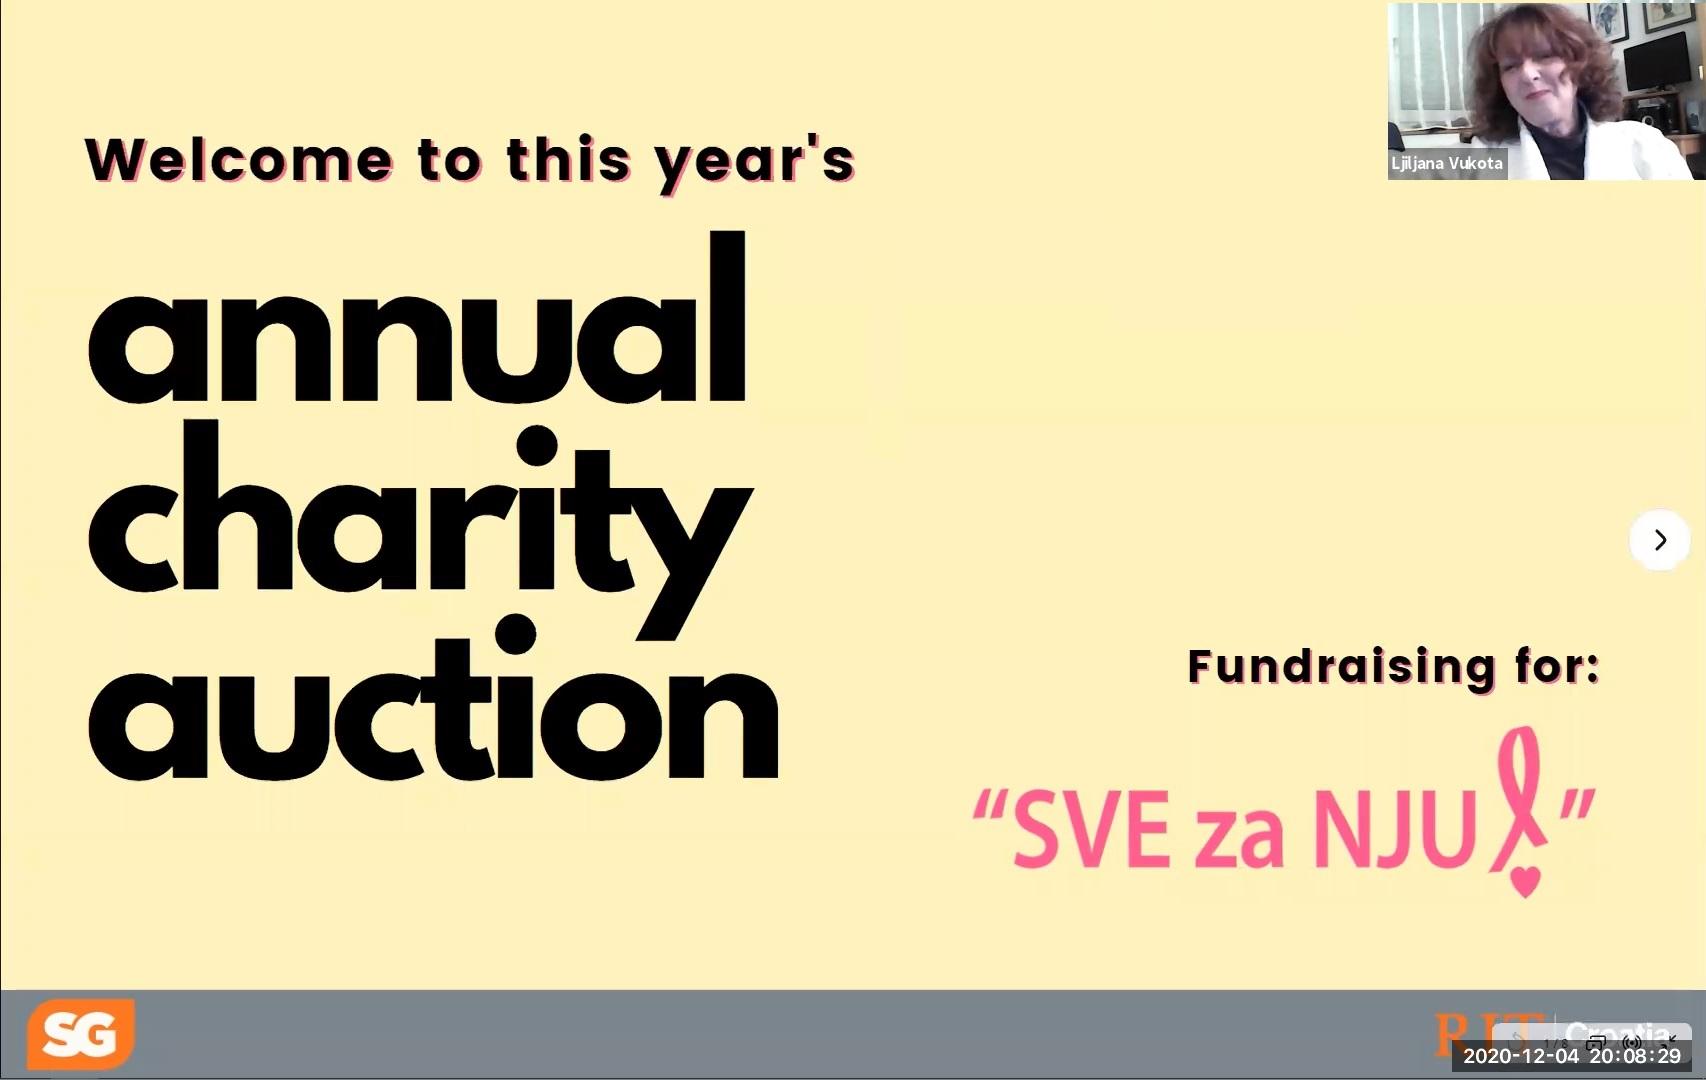 RIT Croatia students raise more than HRK 22,000 for SVE za NJU association